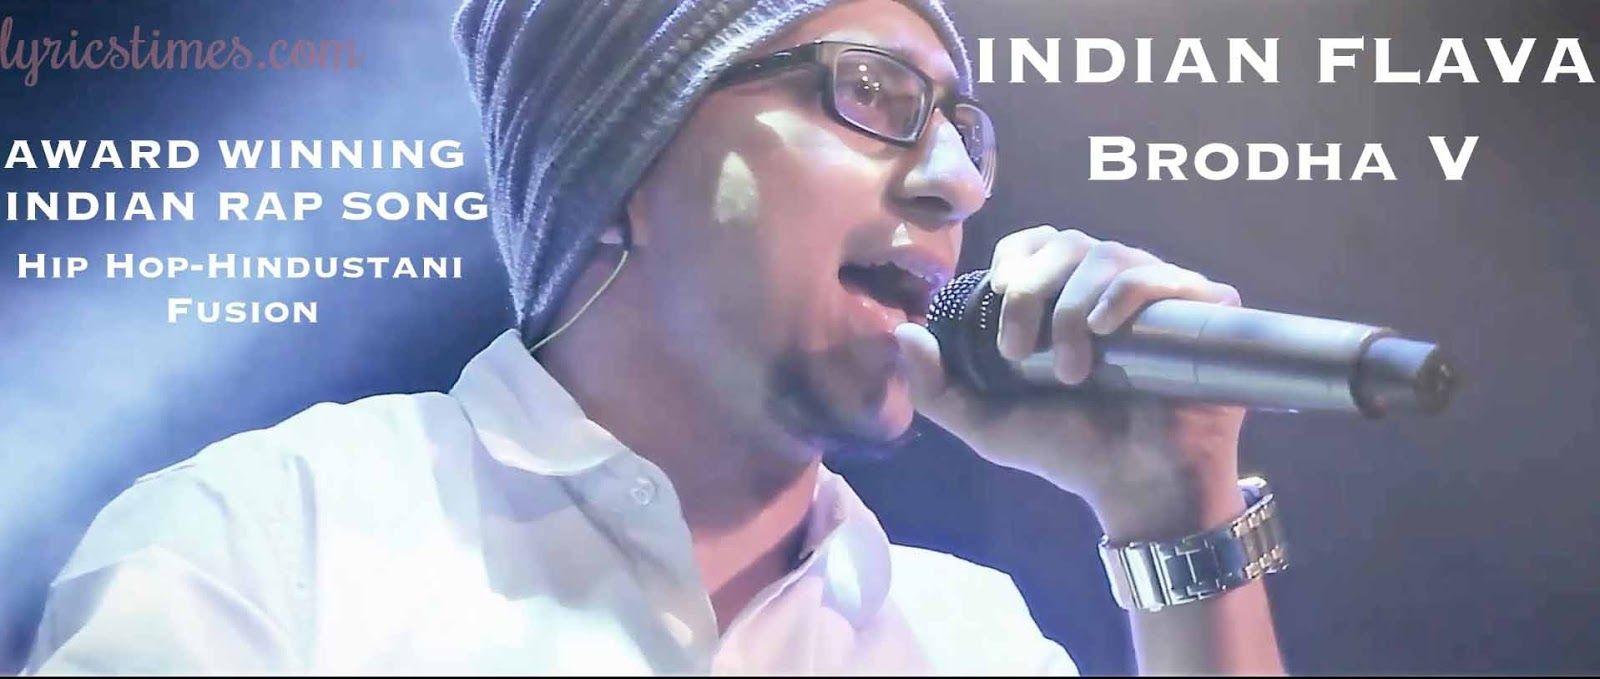 Hindi songs lyrics indian flava lyrics brodha v hip